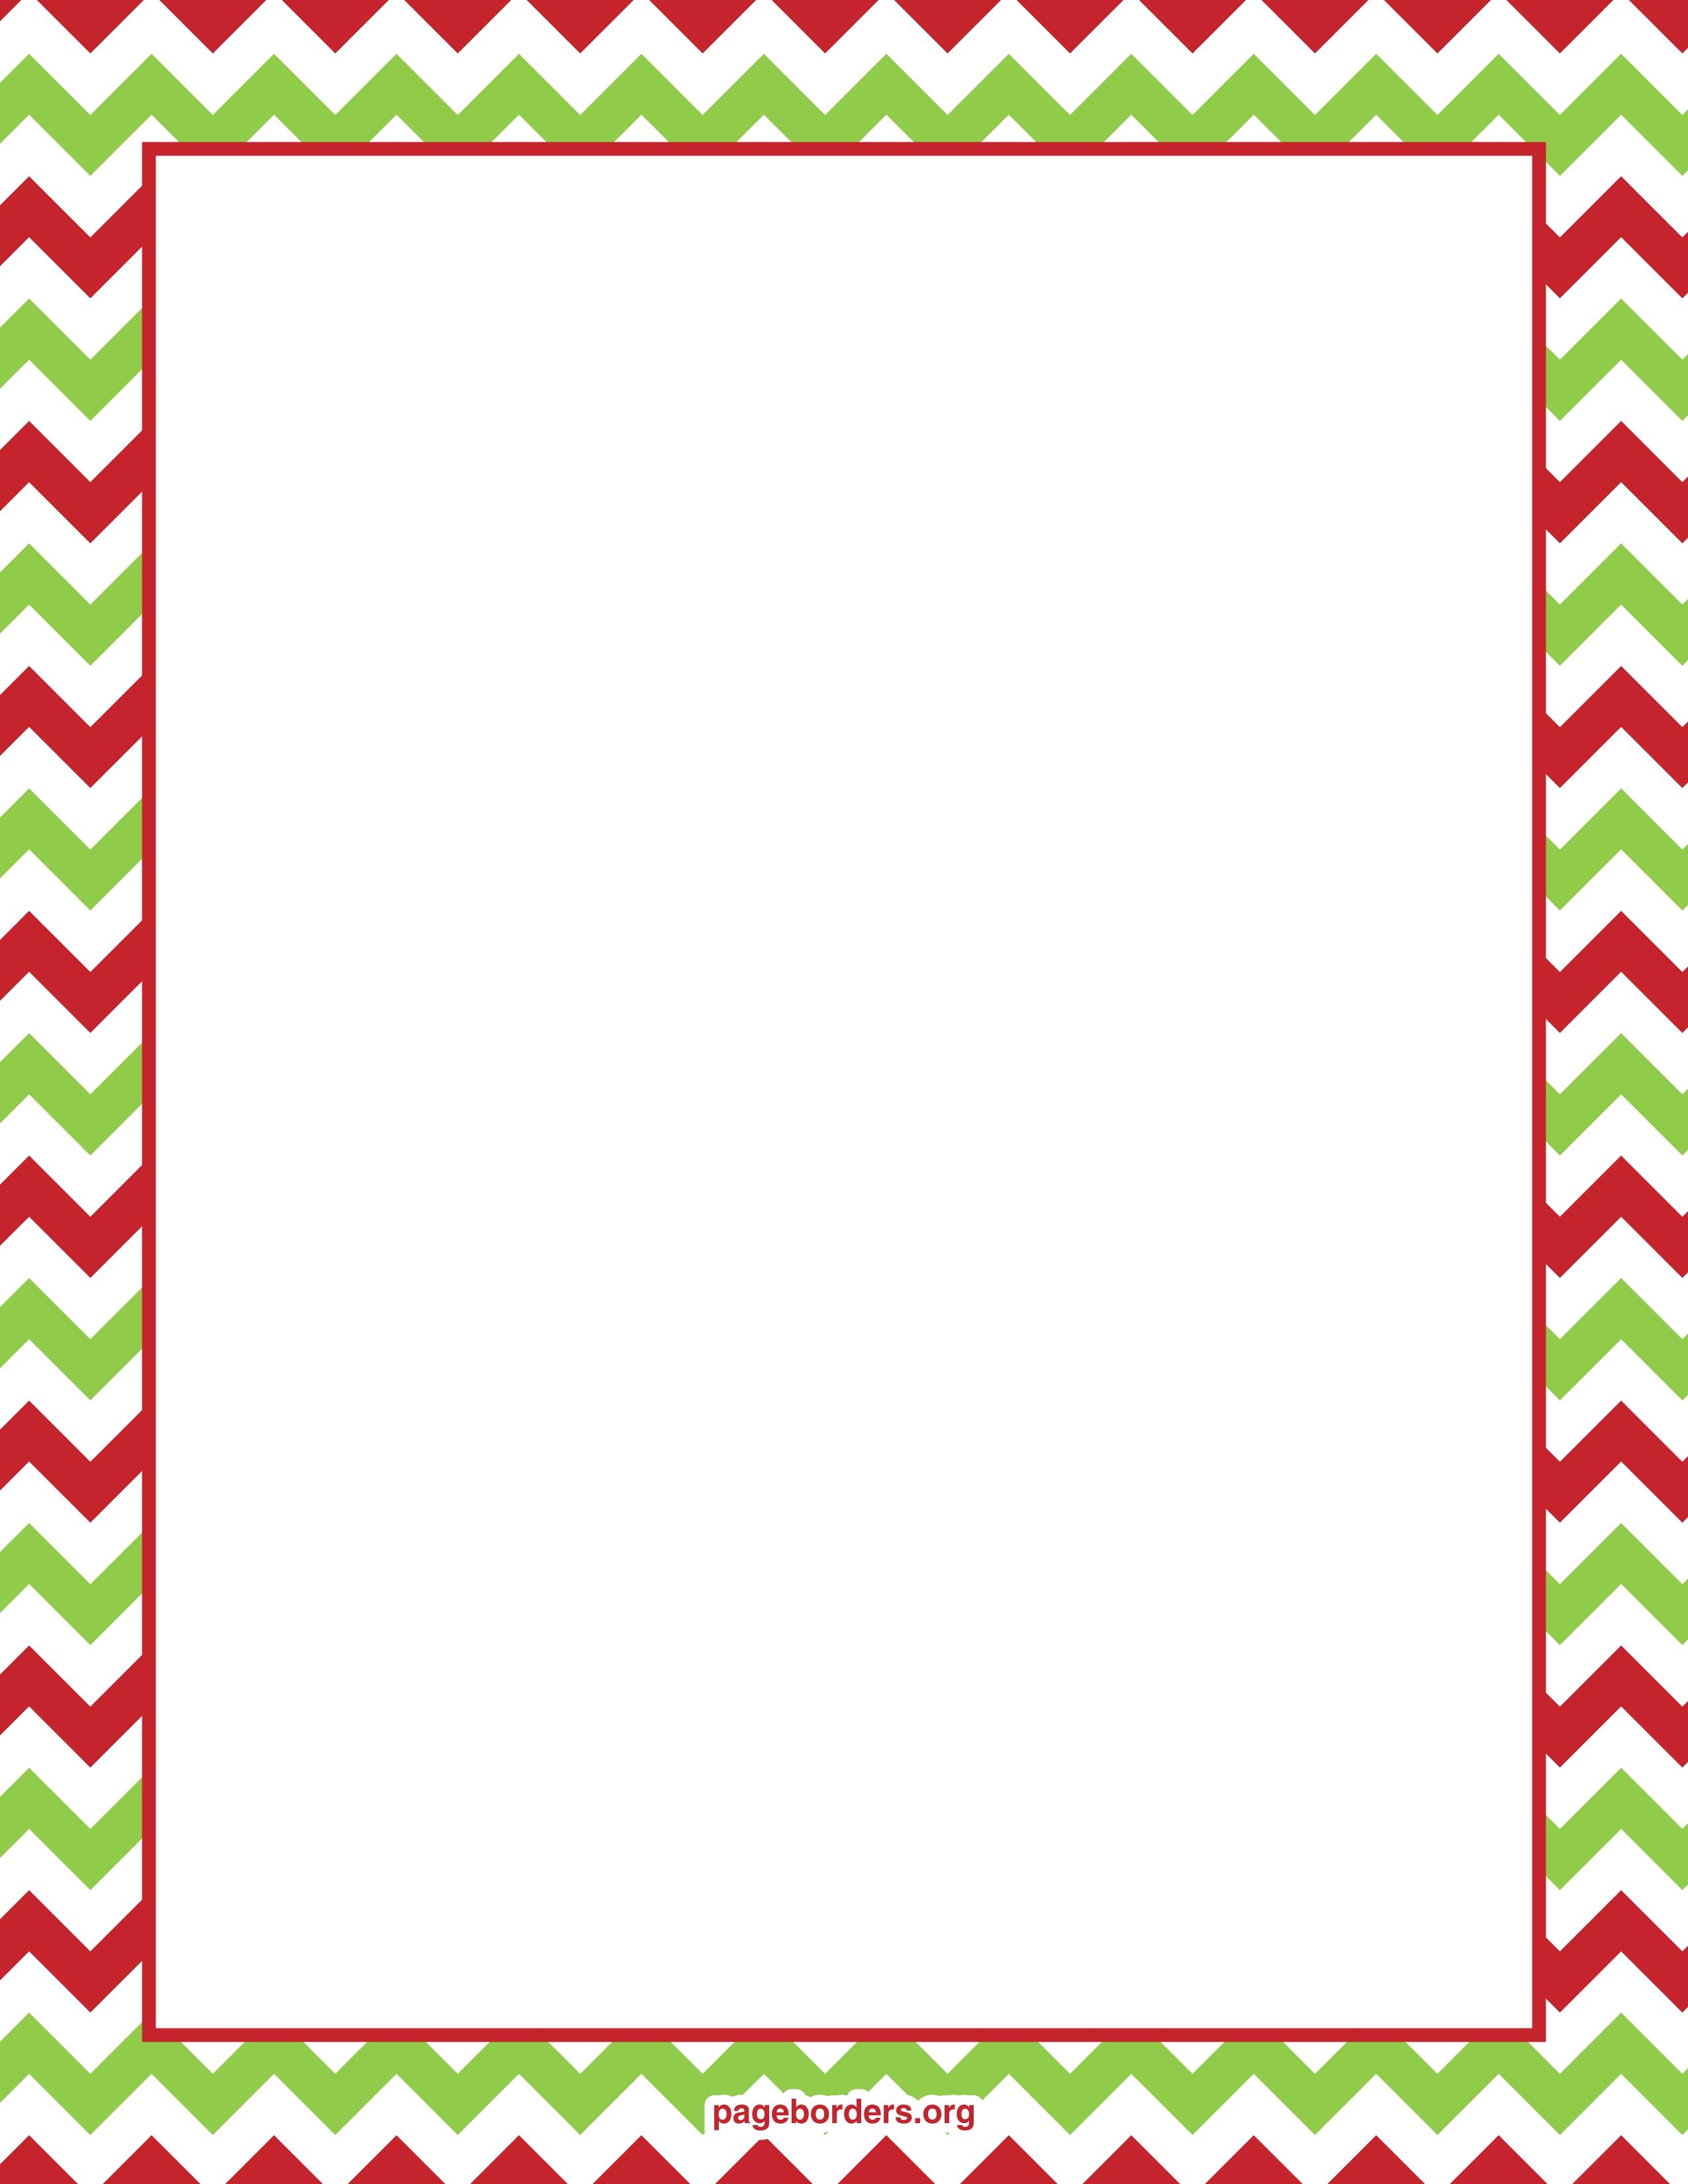 21 Microsoft Christmas Border Templates Free Images - Free Throughout Christmas Border Word Template